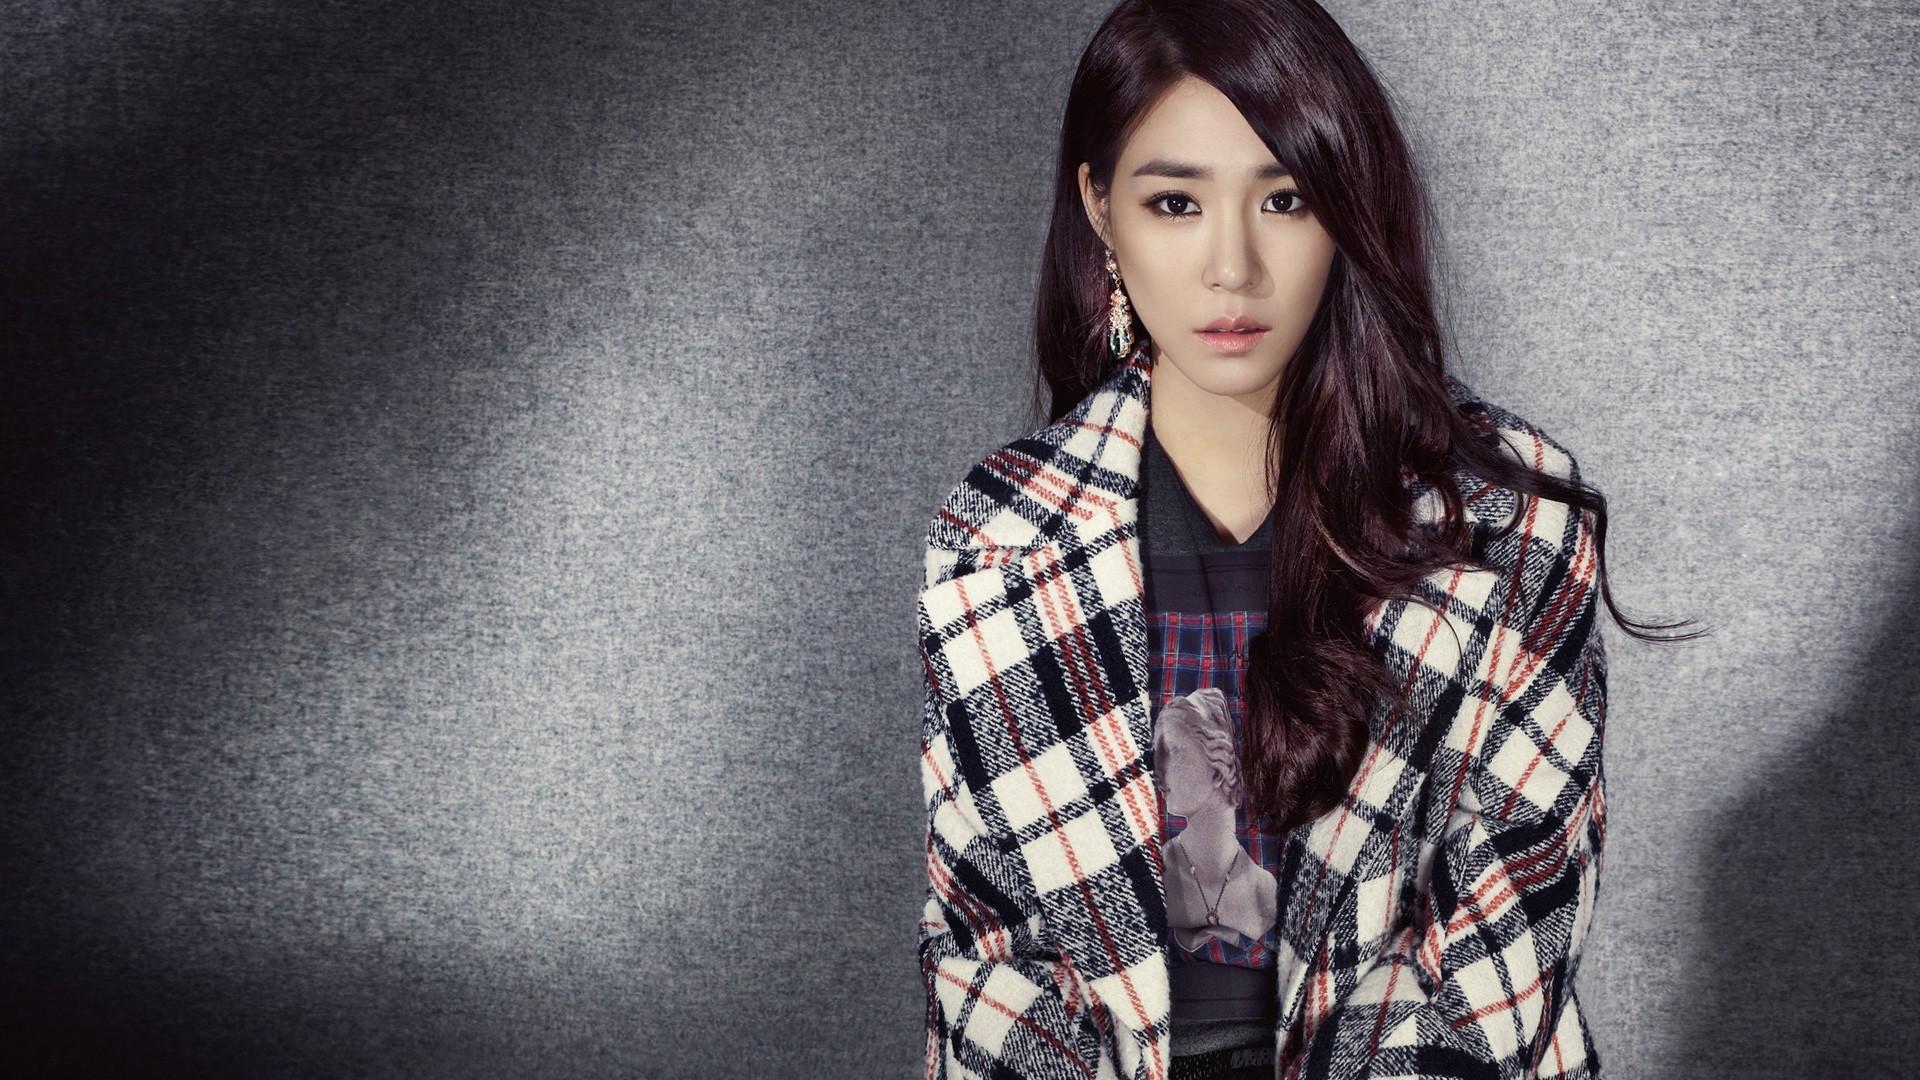 Wallpaper Women Model Long Hair Asian Singer Blue: Tiffany Snsd Wallpapers (68+ Images